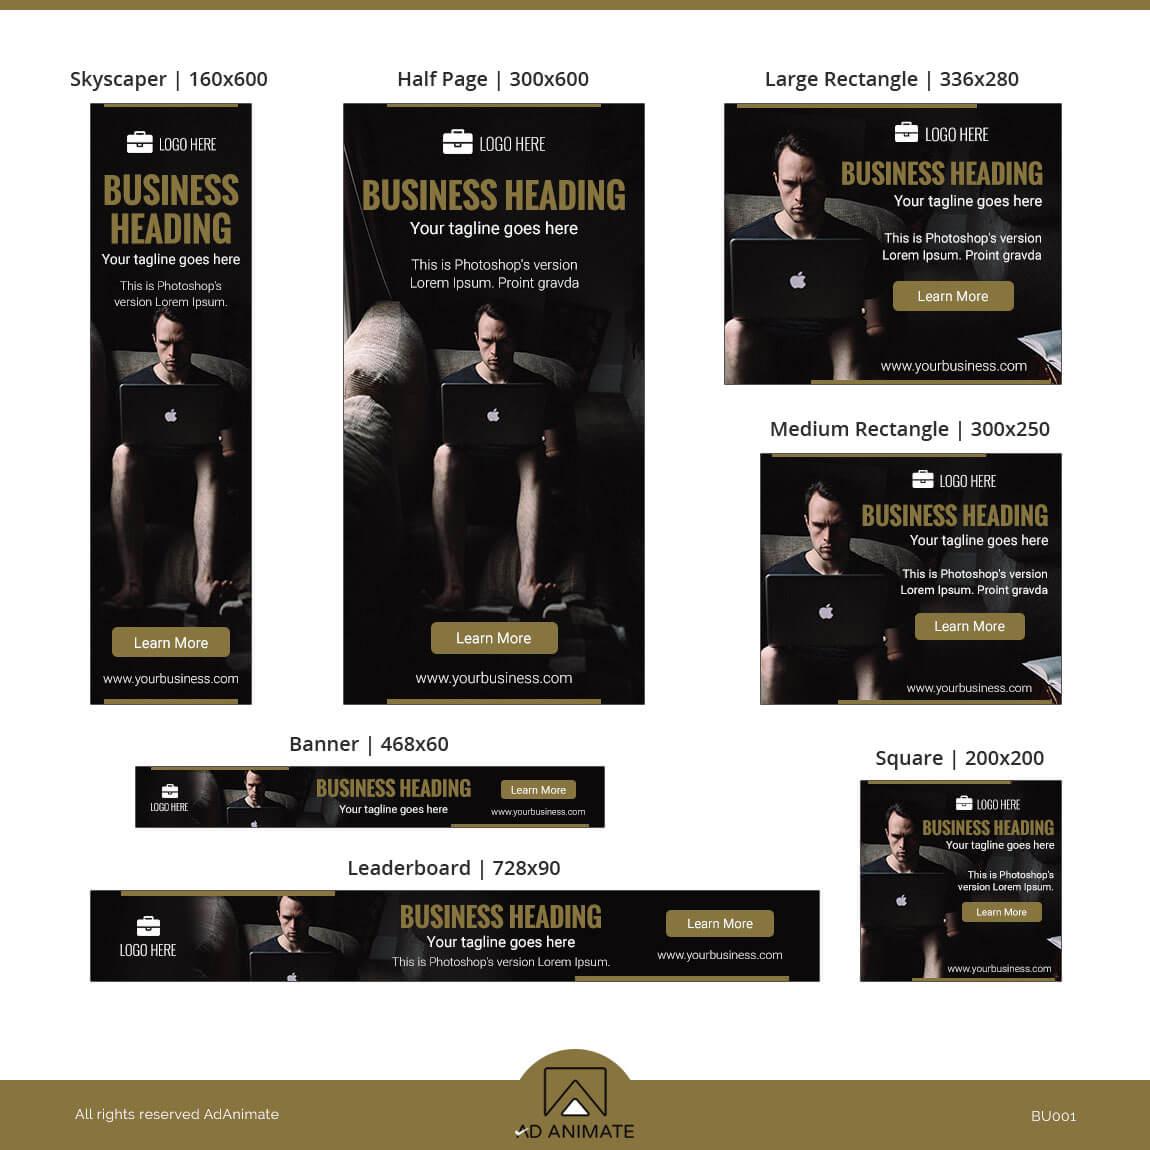 Business Banner html5 ad design